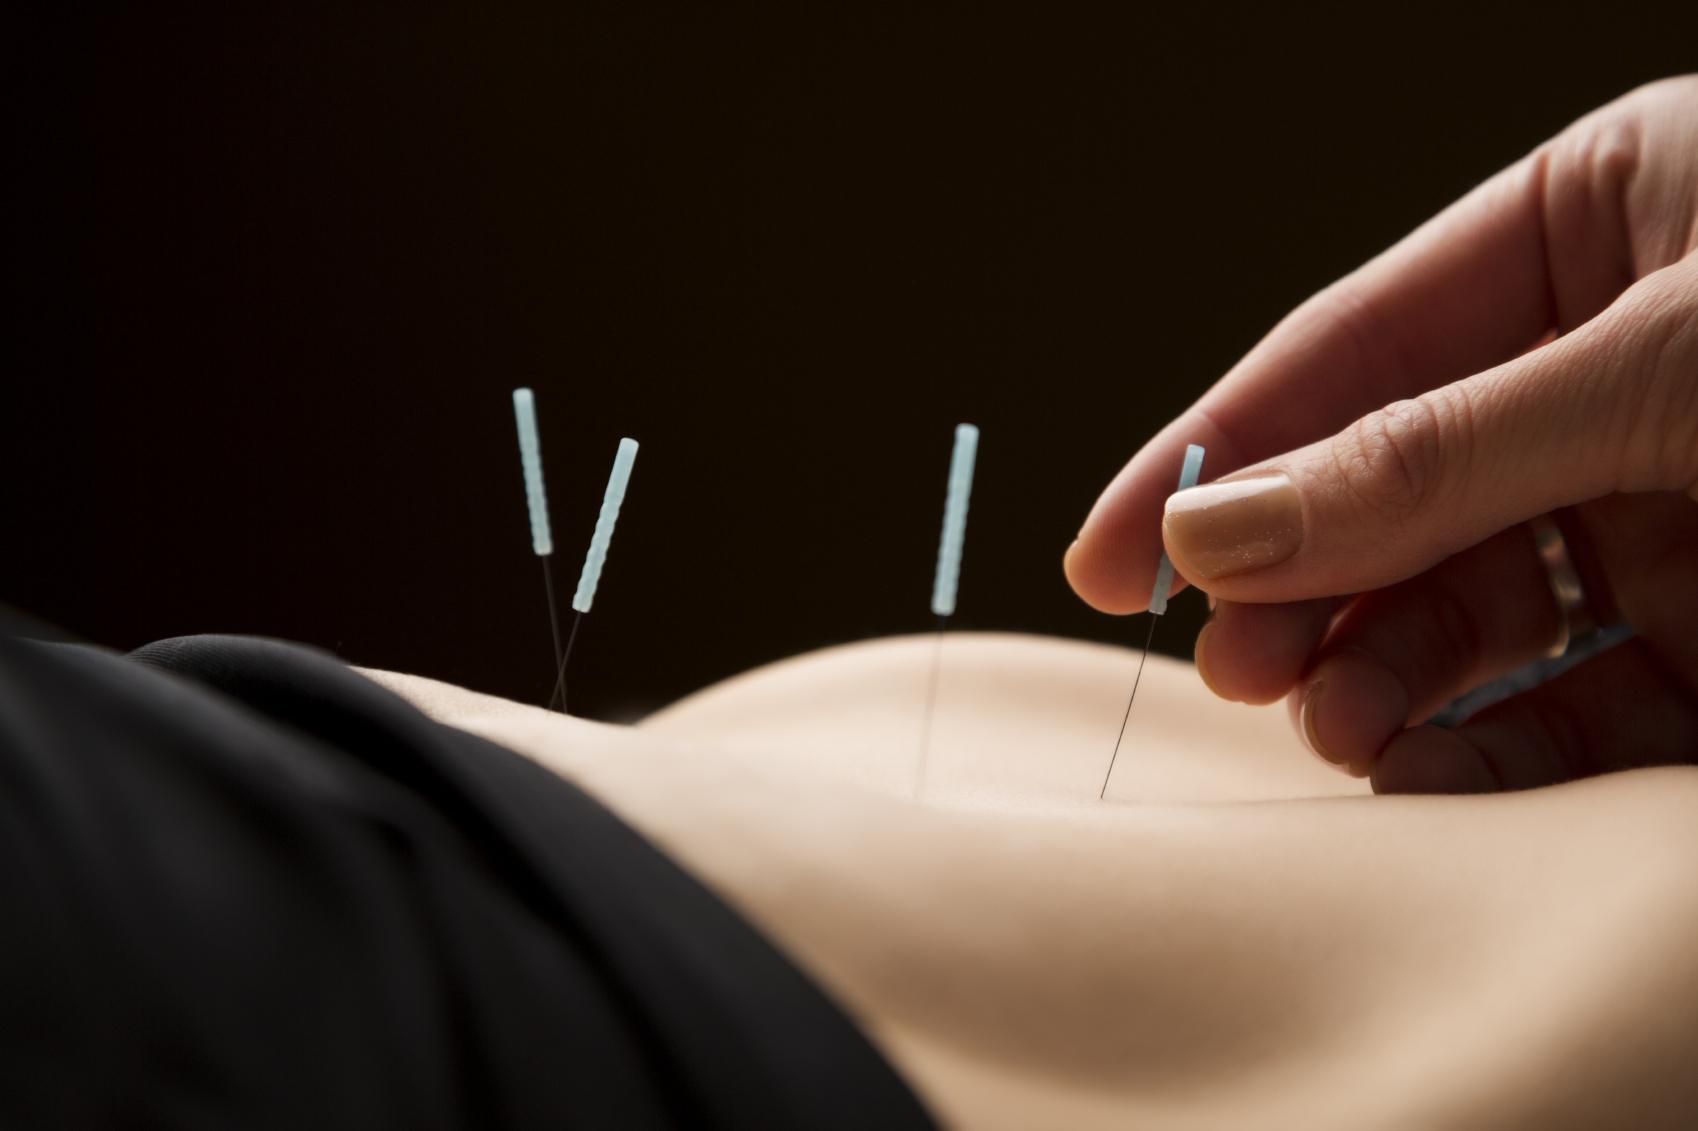 miomas uterinos e acunputura